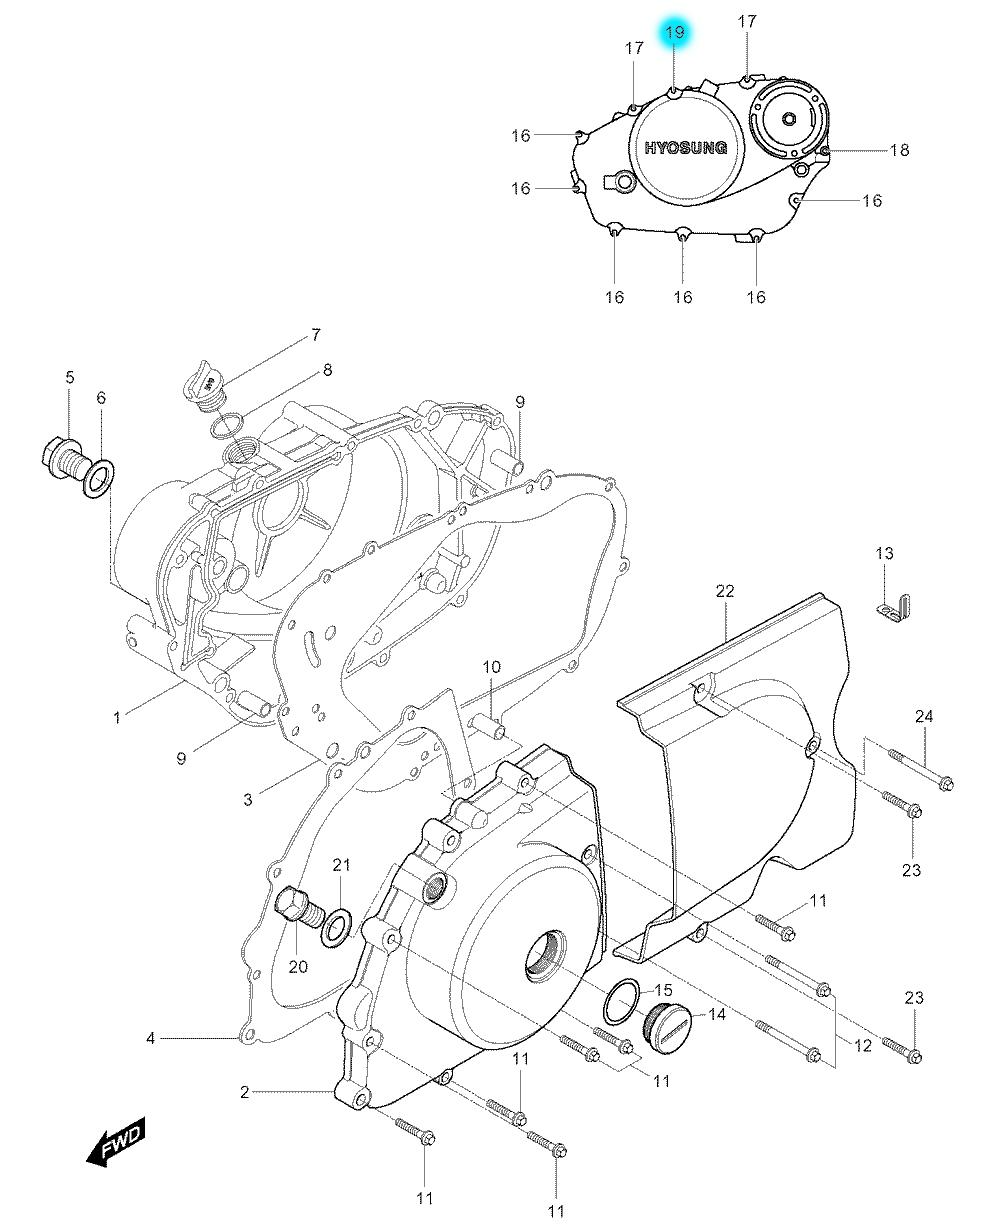 [19] Šroub (motor - kryty skříně) - Hyosung GV 250